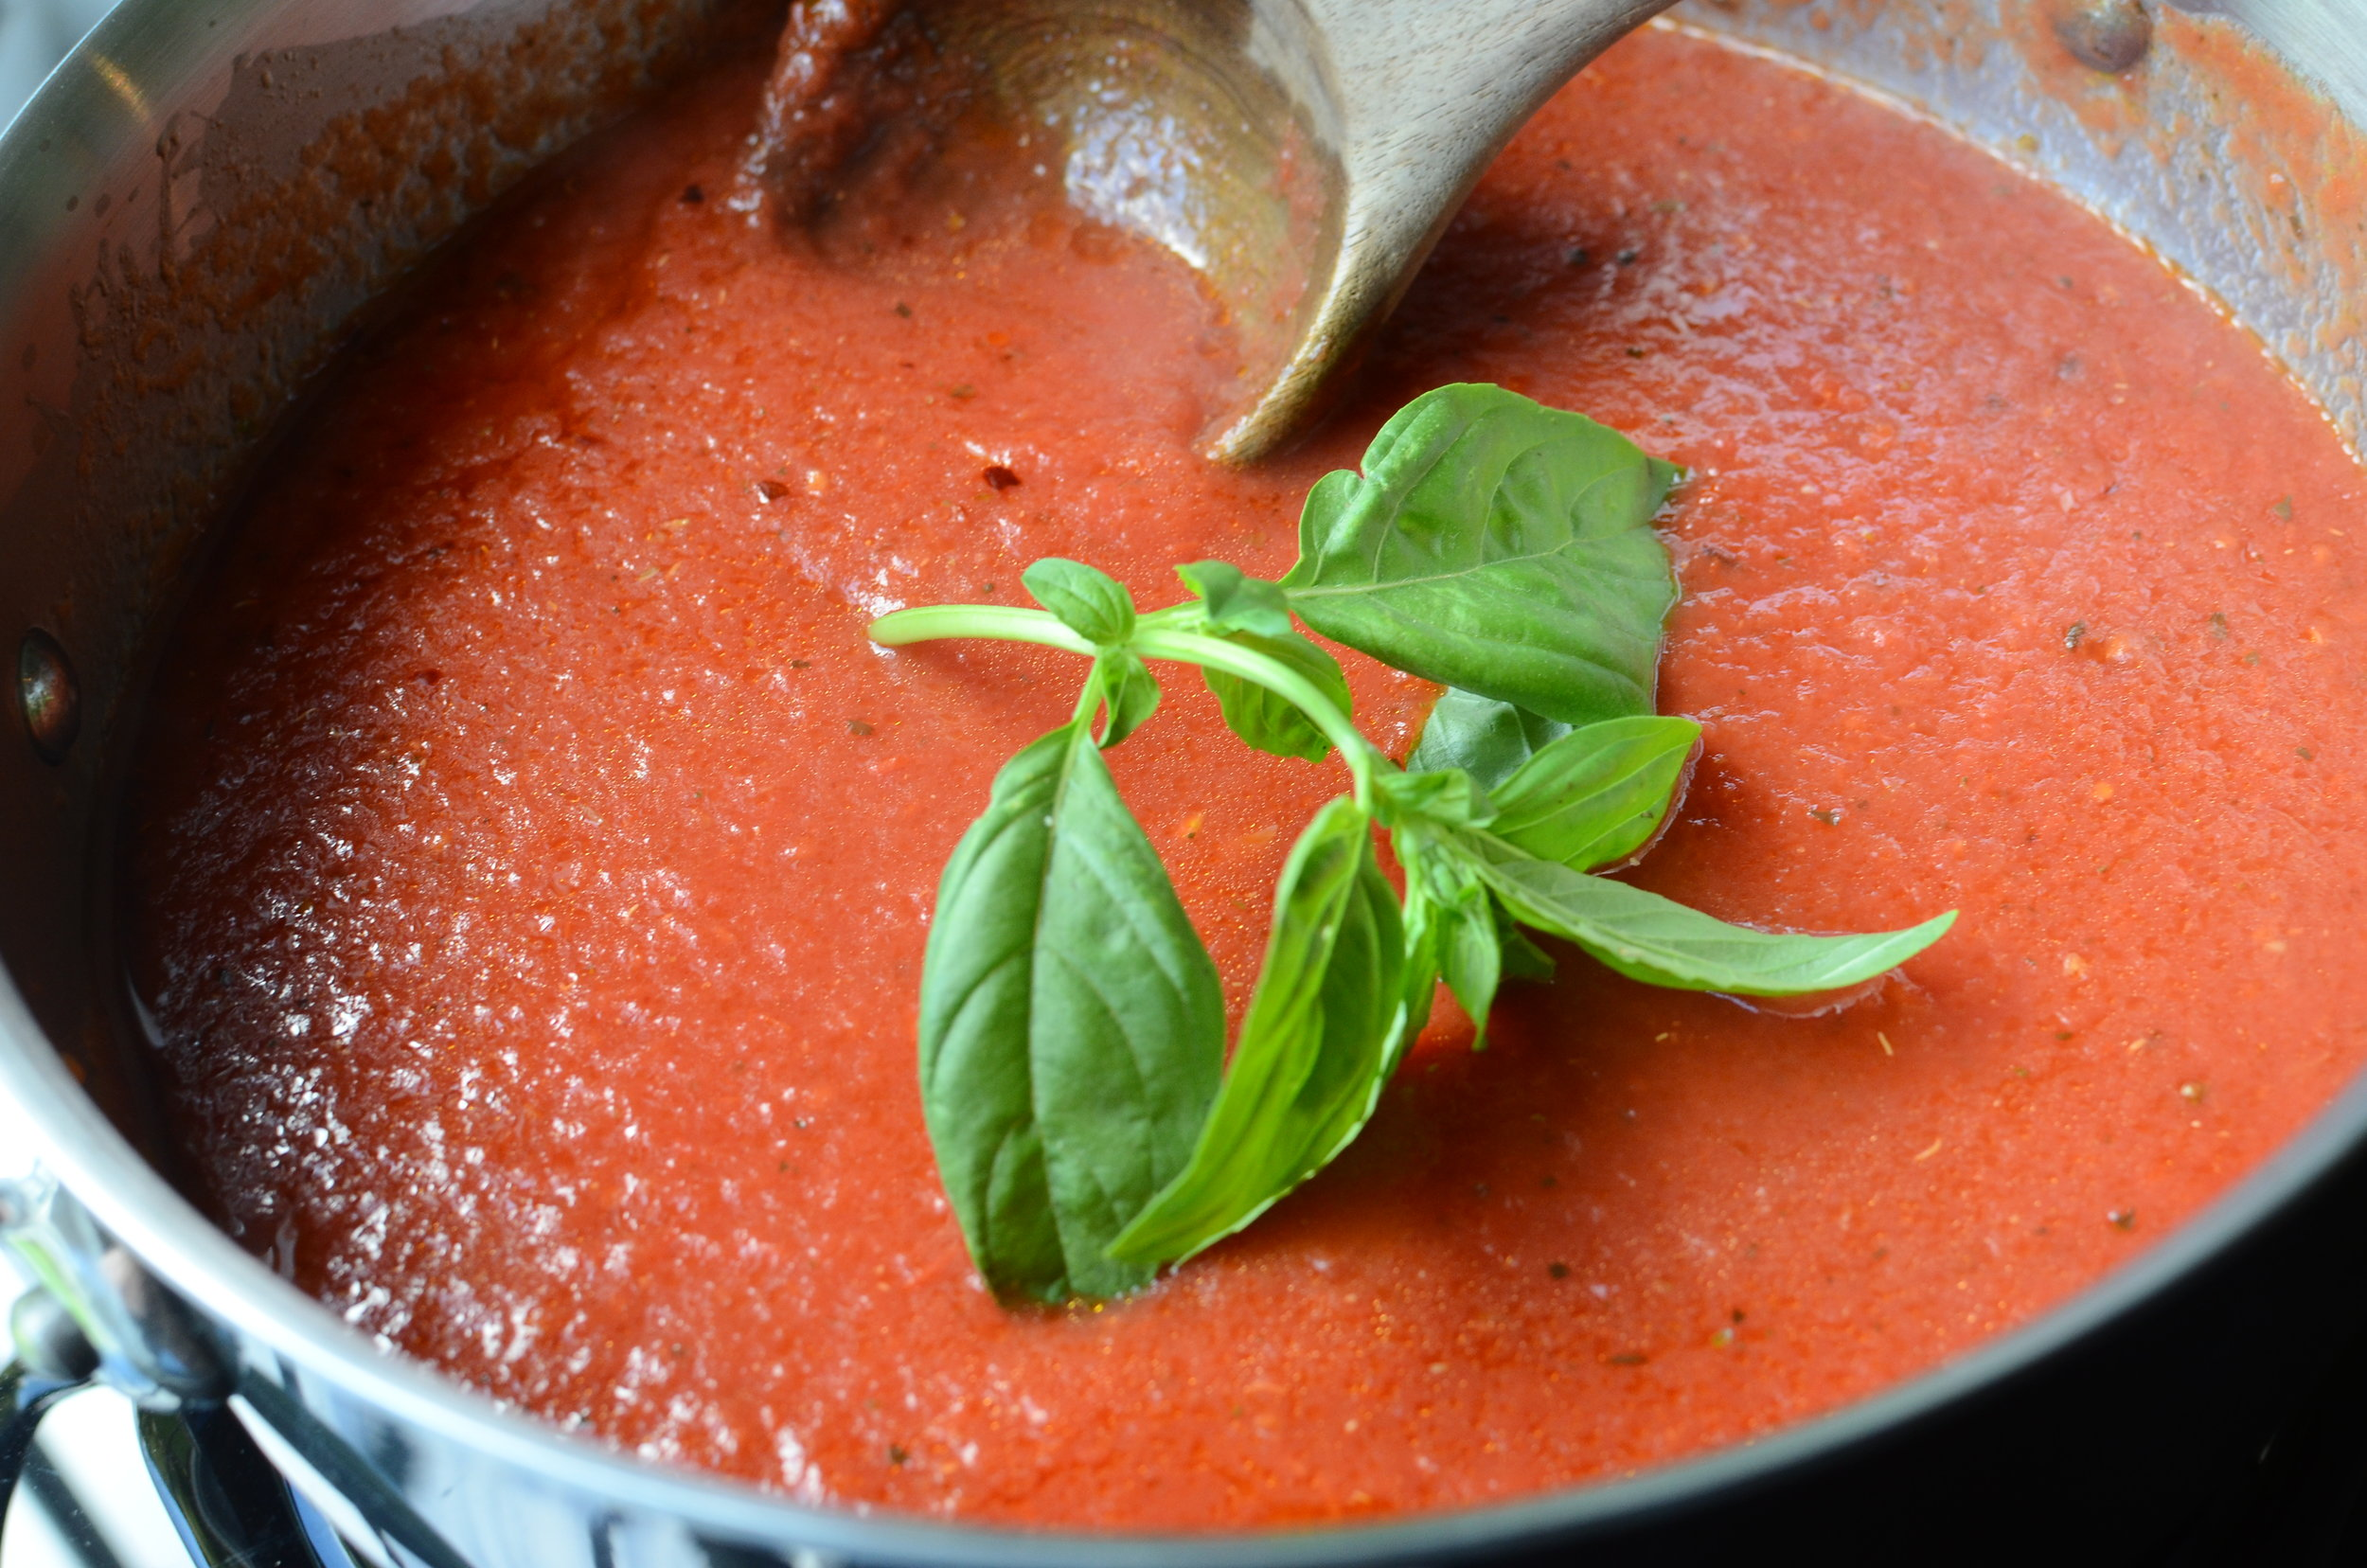 how to make San Marzano tomato sauce. San Marzano tomato sauce recipe. San Marzano Pomodoro recipe. ButterYum. from scratch San Marzano tomato sauce. homemade spaghetti sauce. how to make homemade spaghetti sauce. how to make homemade pasta sauce from canned tomatoes. san marzano tomato sauce recipe. san marzano sauce. san marzano tomato sauce. san marzano spaghetti sauce. san marzano pasta sauce. san marzano tomato sauce from scratch. tomato sauce san marzano. marzano tomato sauce. homemade san Marzano tomato sauce. canned san marzano tomato sauce recipe.